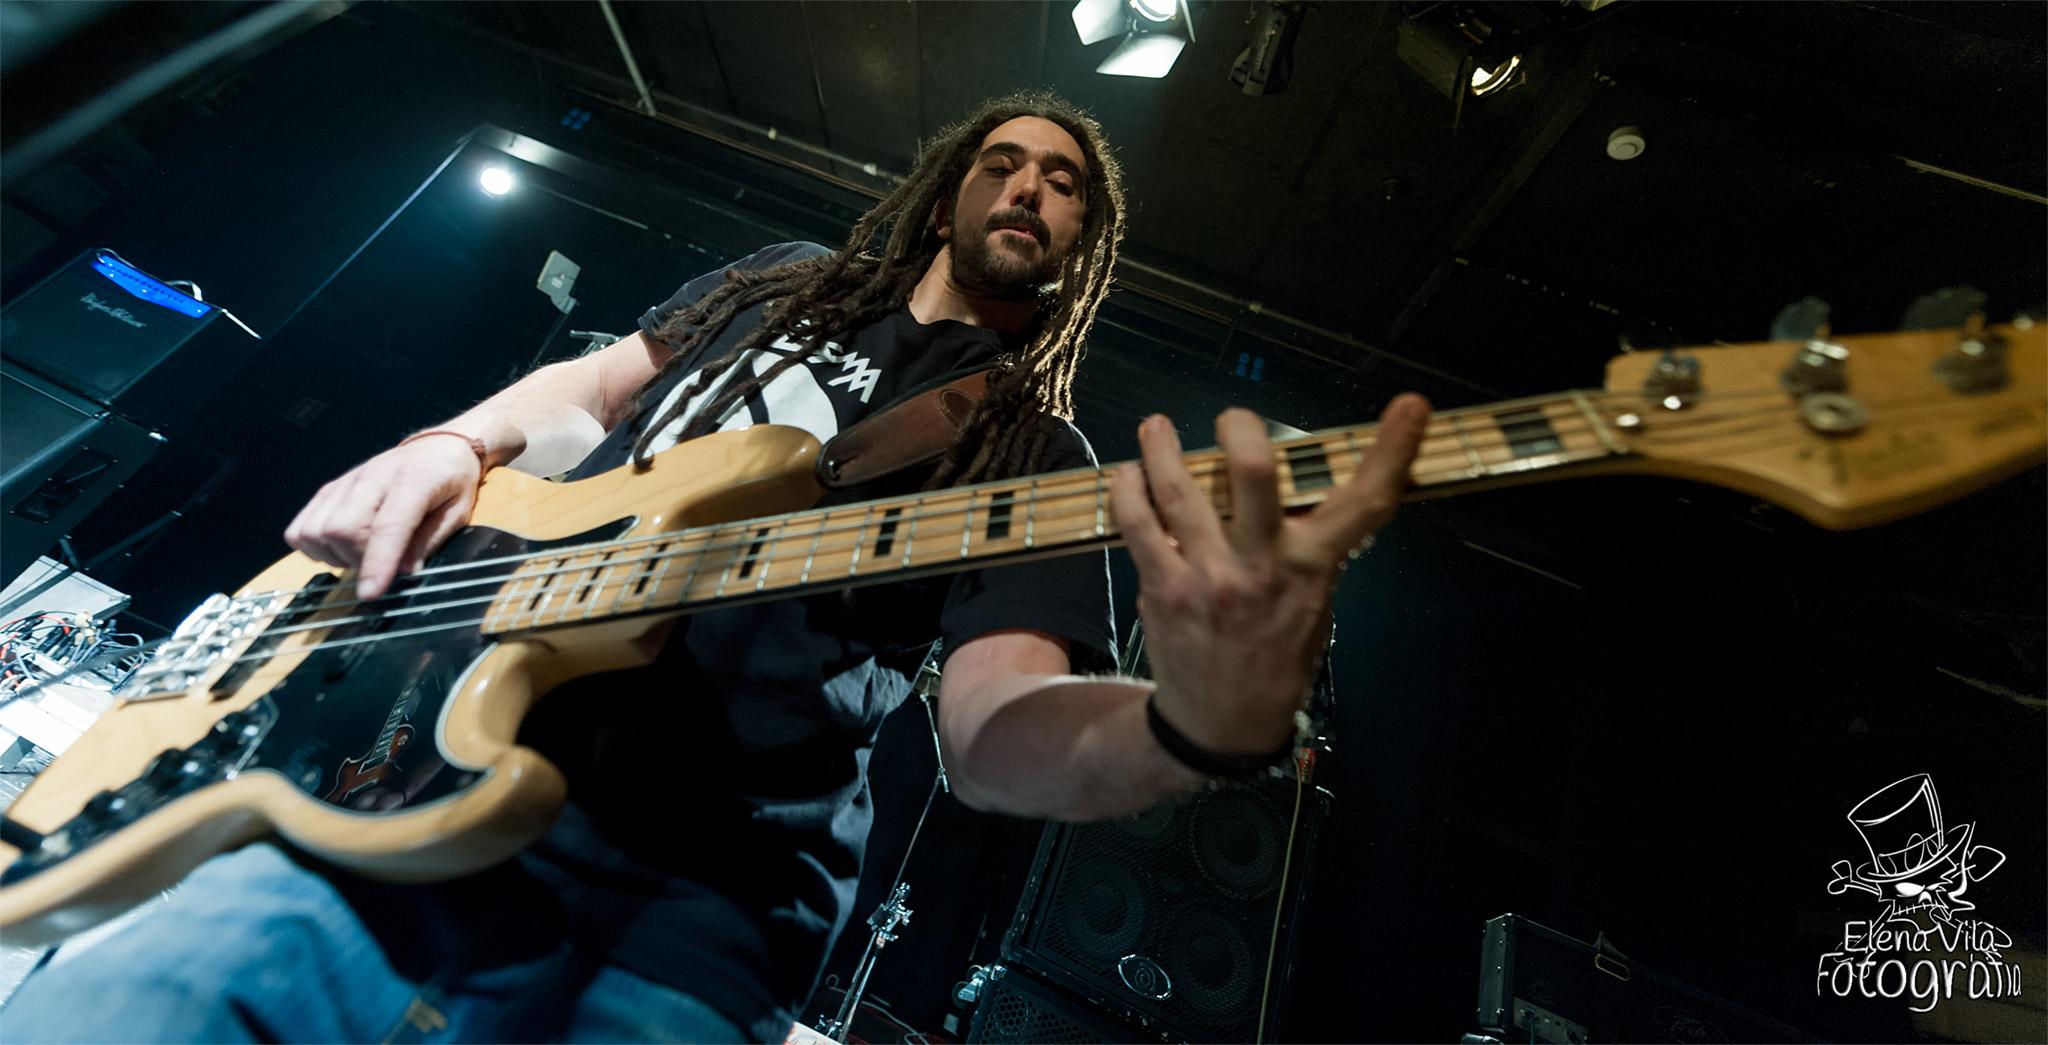 Elisma rock'n'civic 13